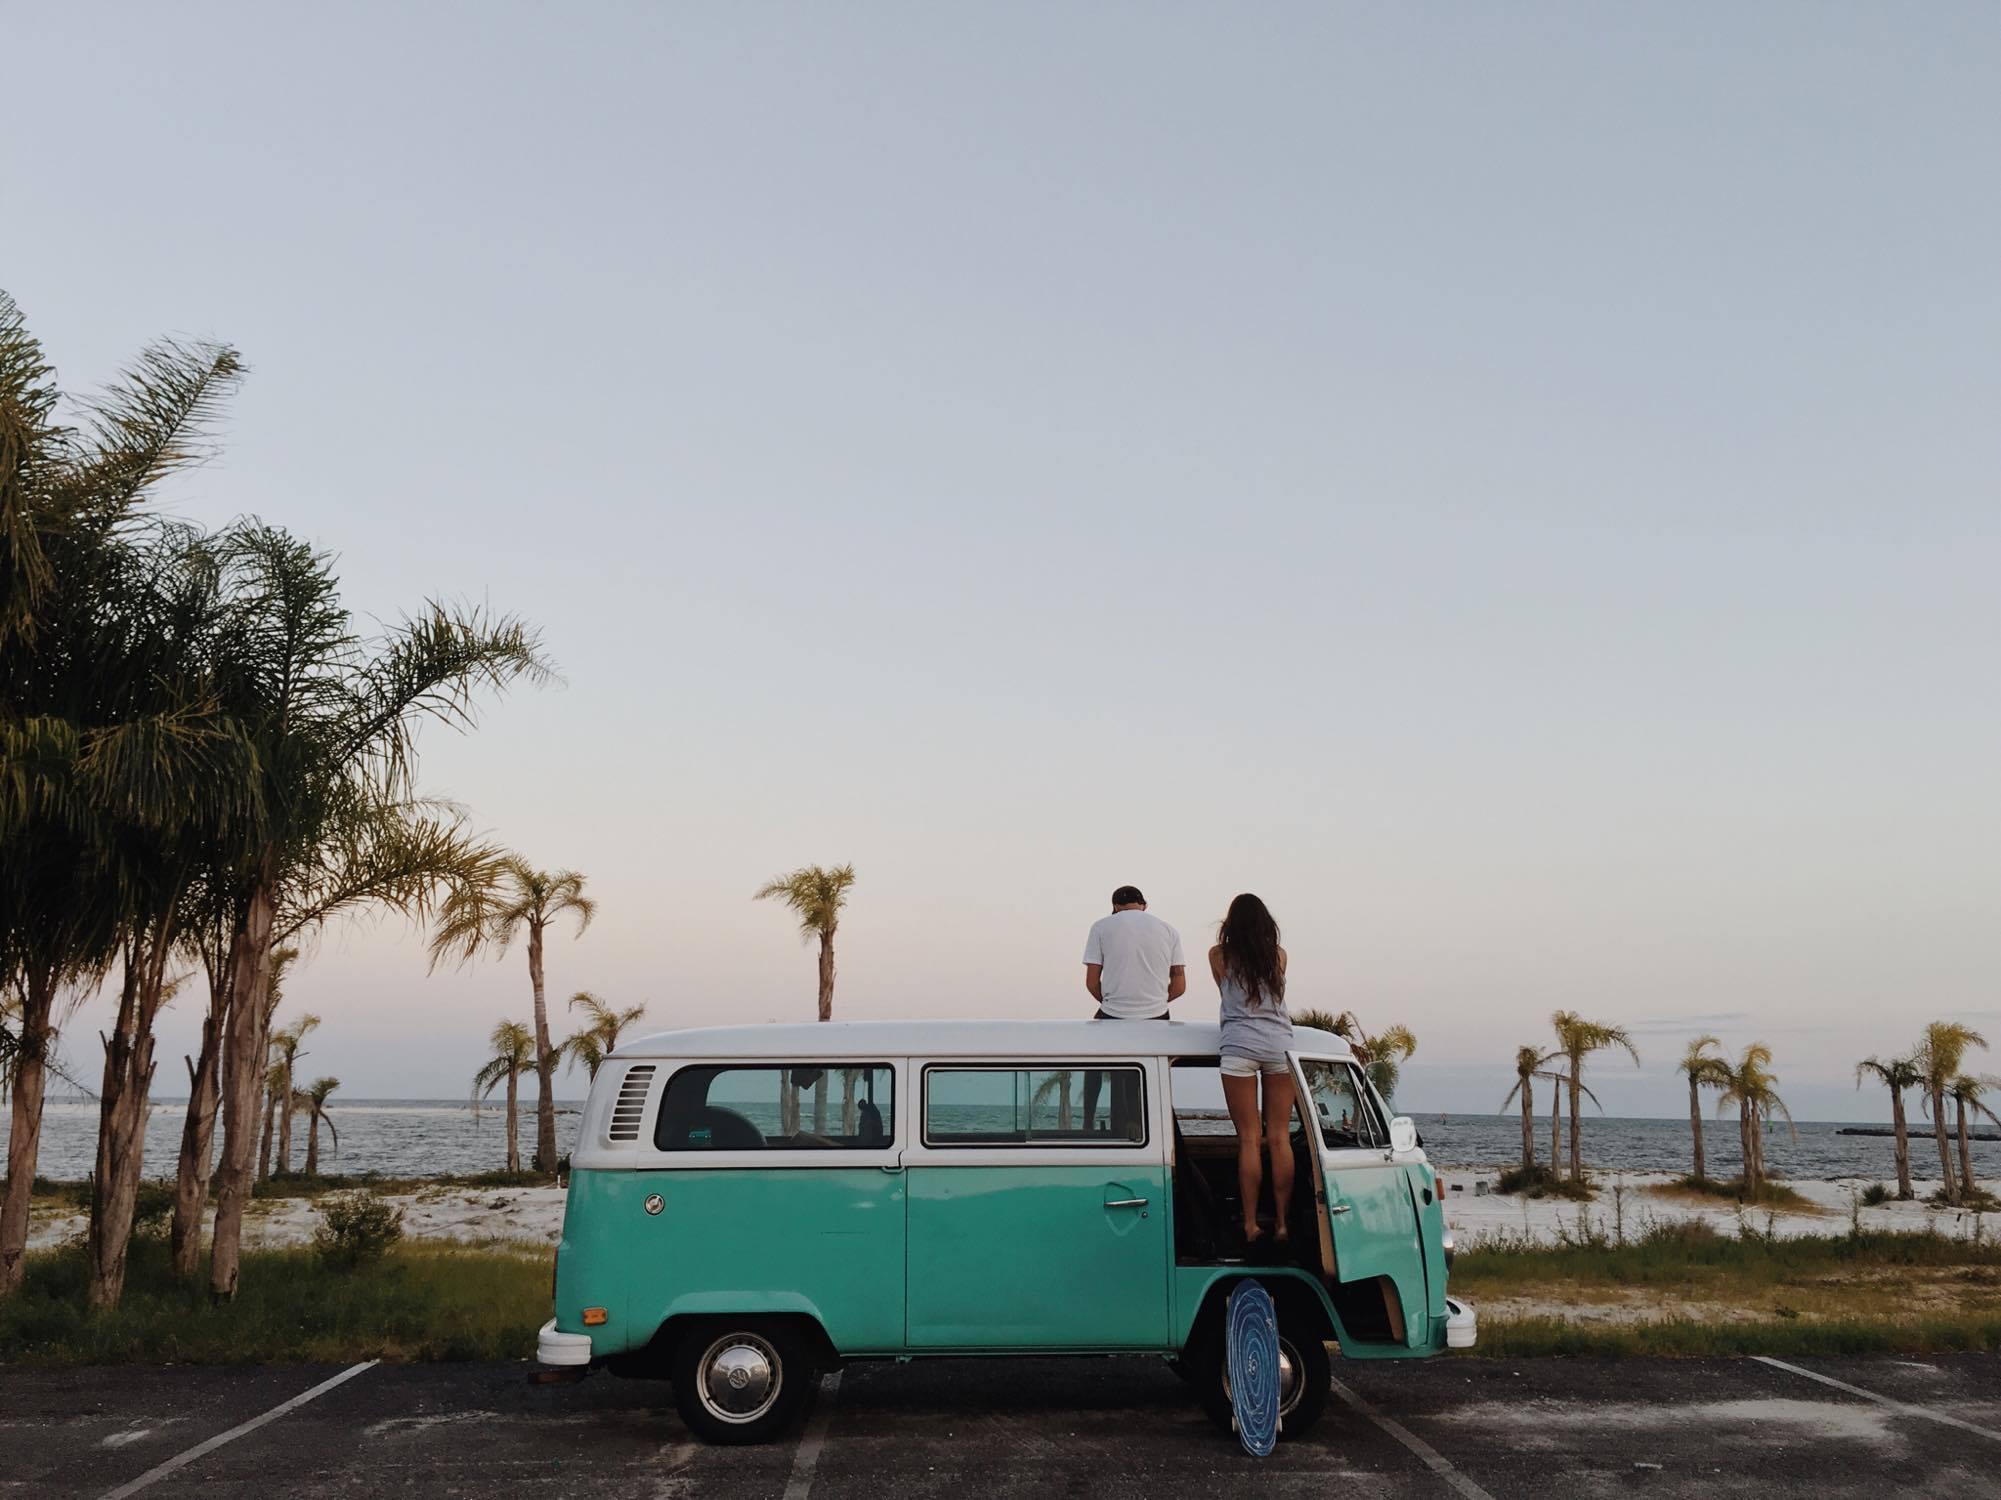 orange-beach-alabamba-v-w-van-california